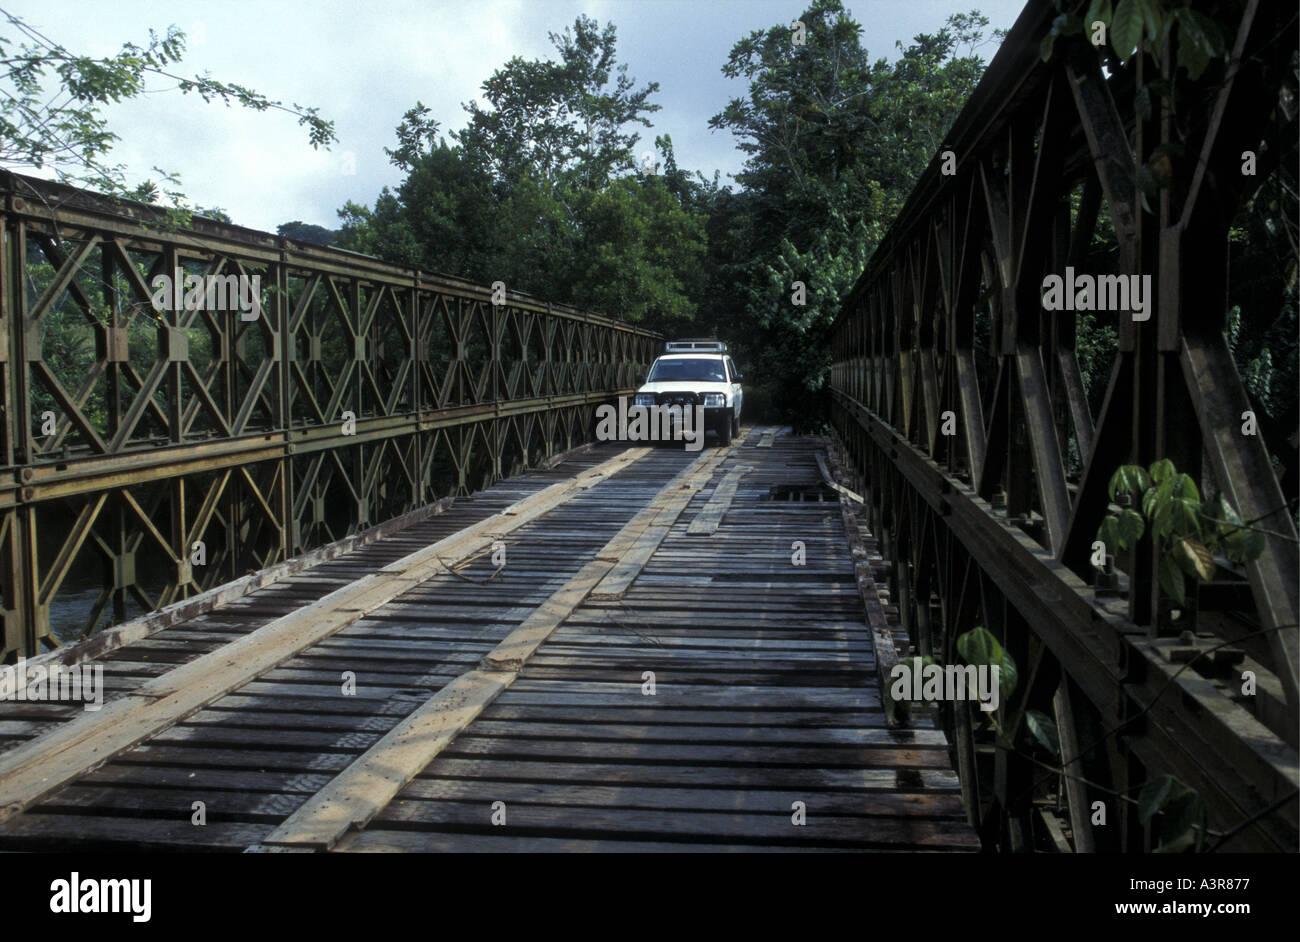 White four wheel drive vehicle crossing dilapidated Bailey type bridge Ivindo National Park Gabon West Africa - Stock Image